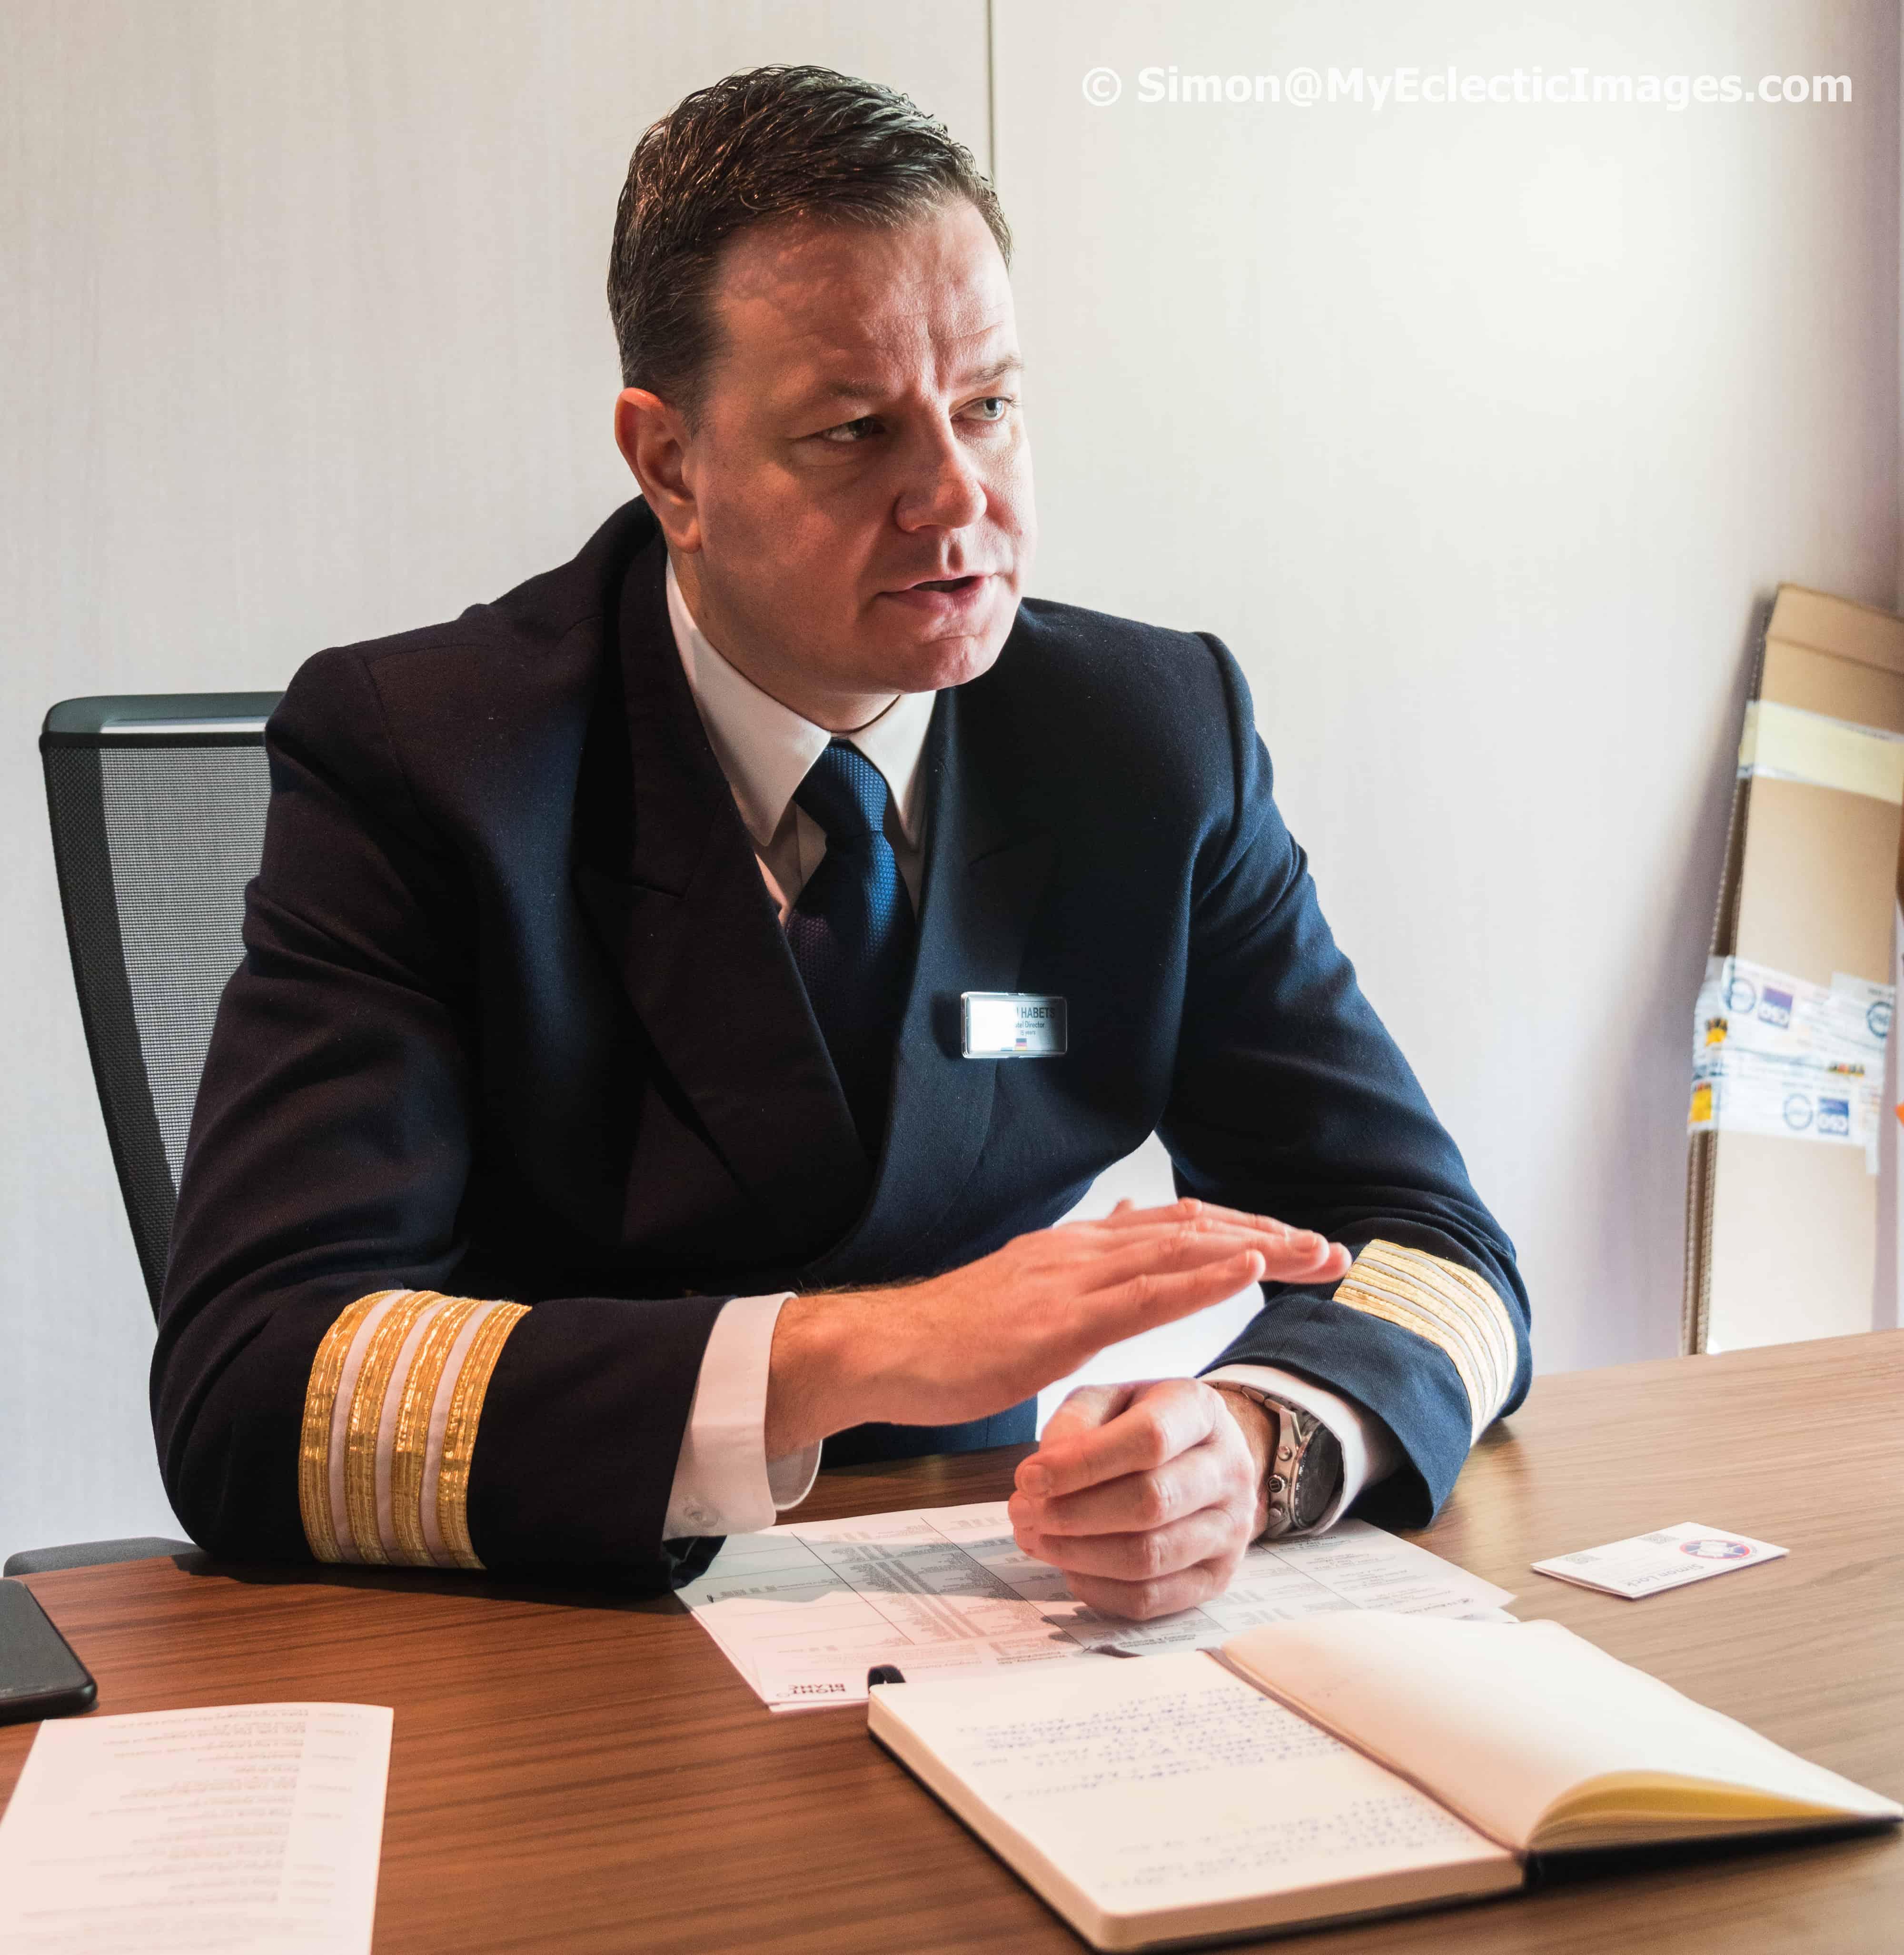 Don Habets, Hotel Director Aboard the Nieuw Statendam